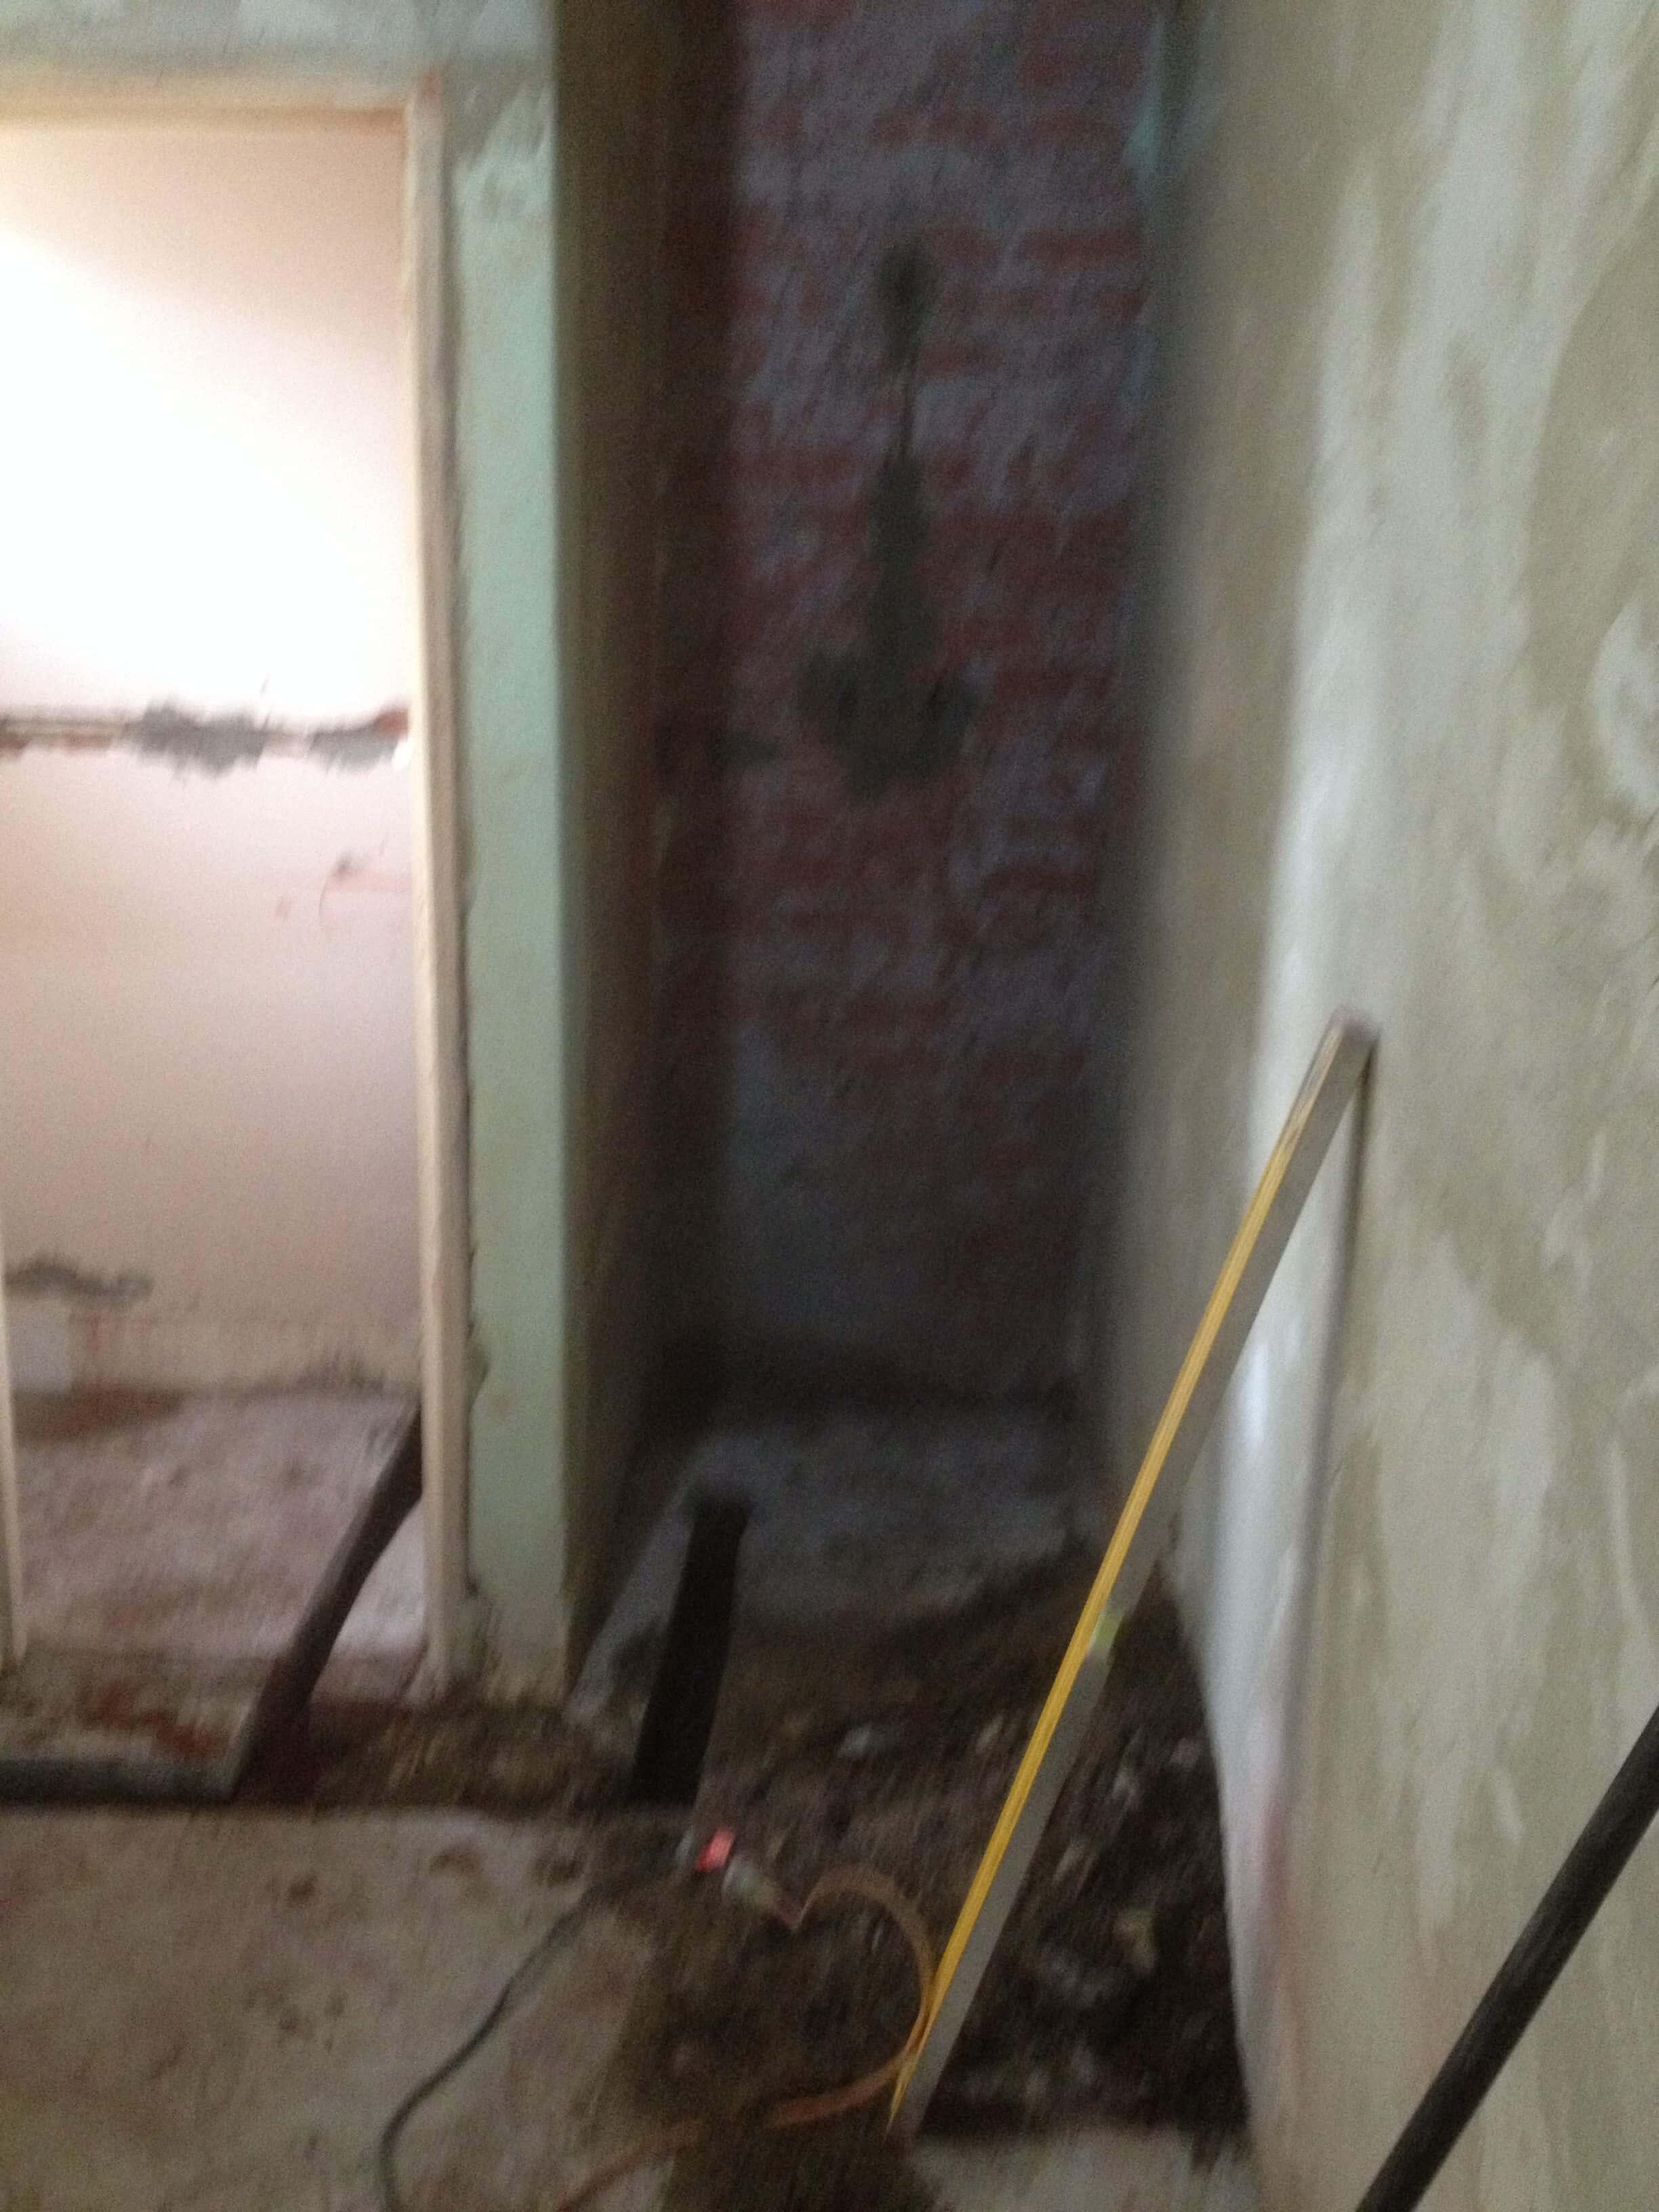 Everyday Plumbers Renovations Works - Construction Work in Progress 2230